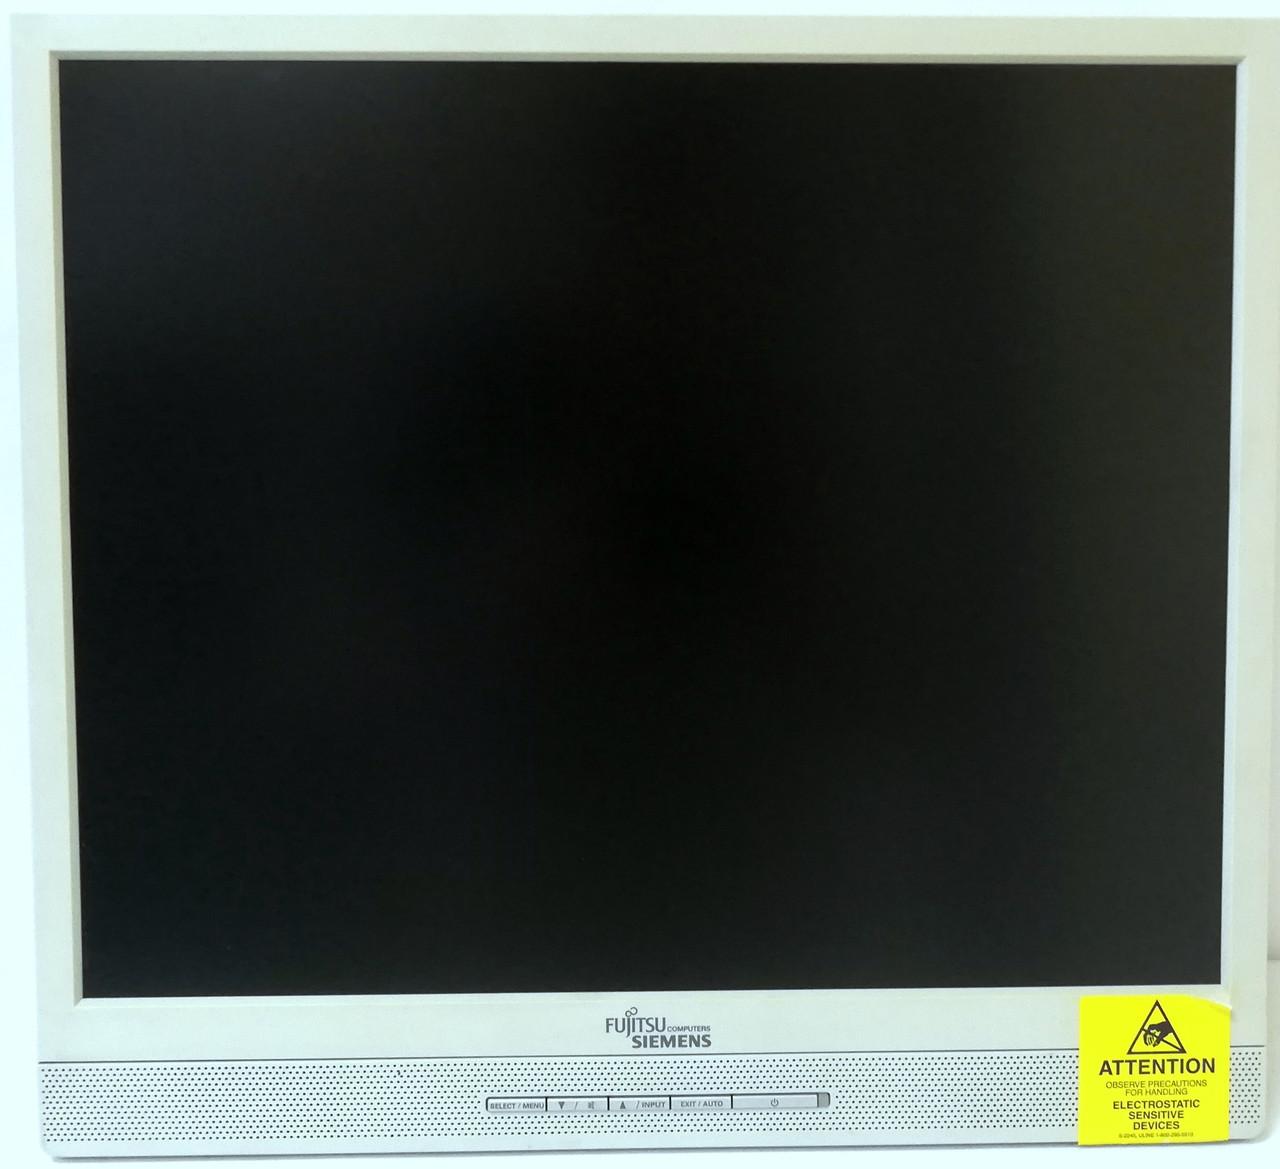 "Монитор Fujitsu Siemens Scenicview P19-2 19"" (S26361-K983-V150) TFT PVA 1280x1024 DVI VGA Б/У Под сервис"